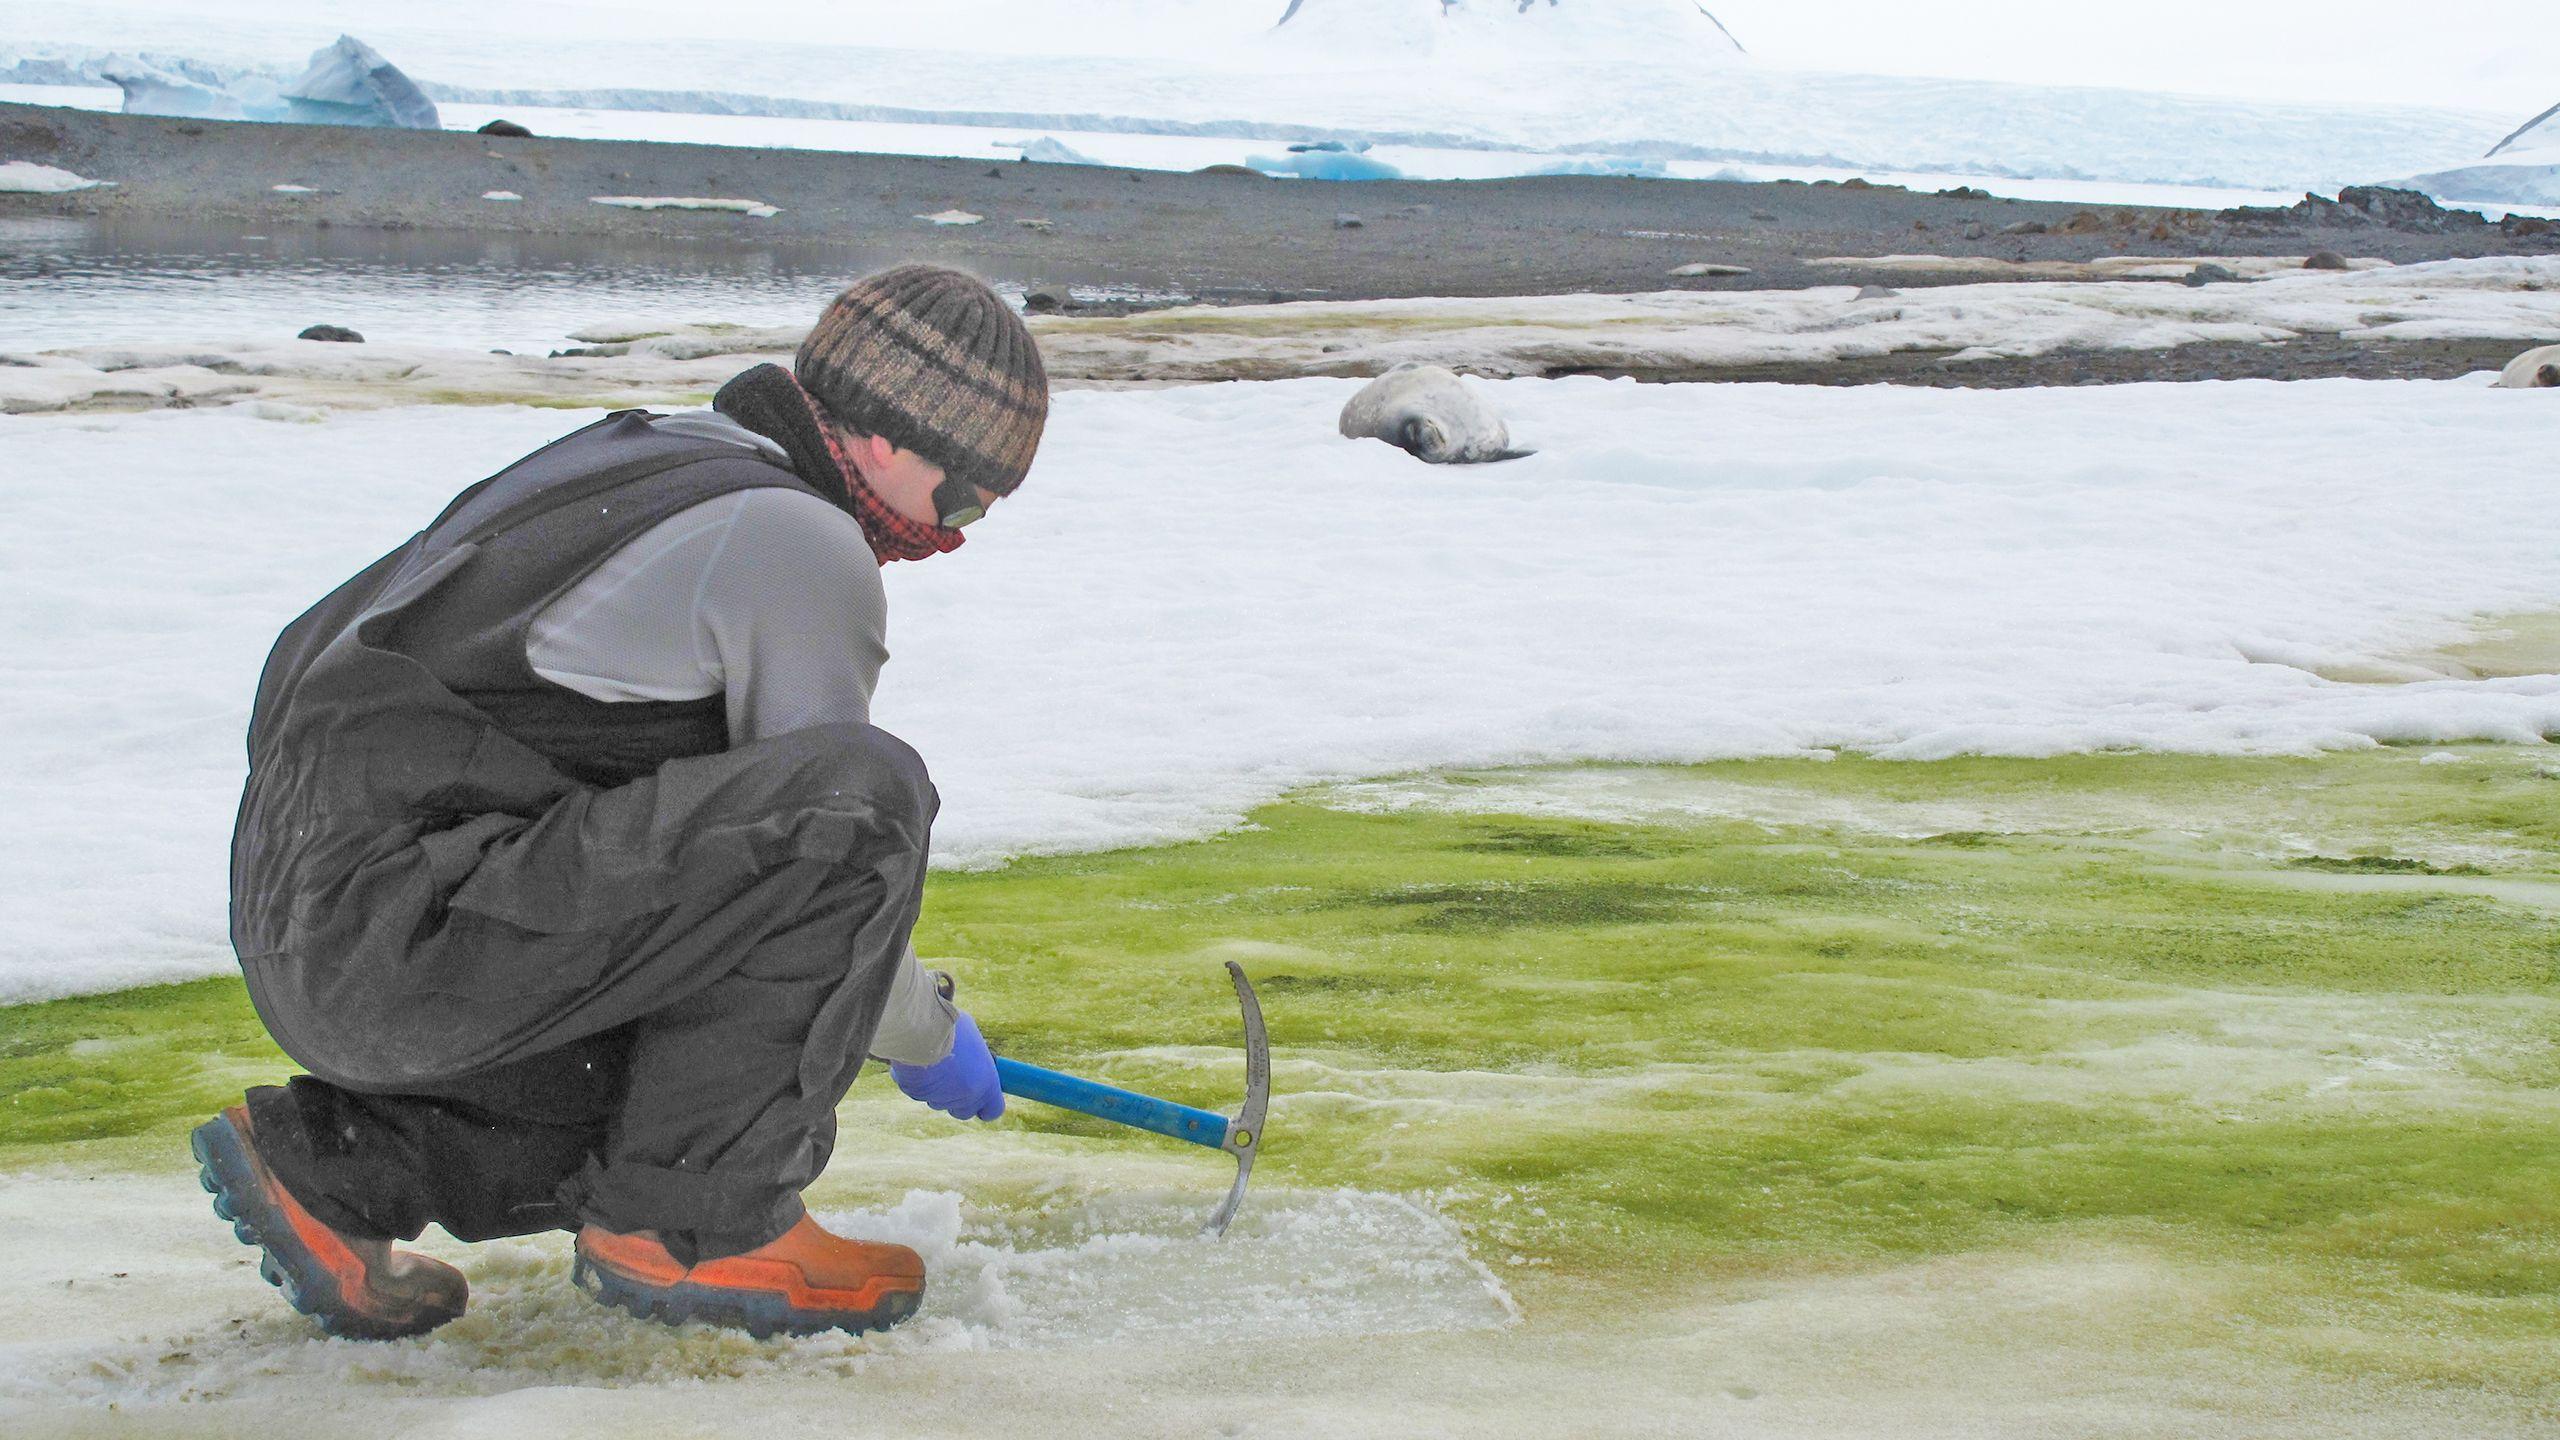 Algas verdes en la Antártida. Foto: Sarah Vincent.